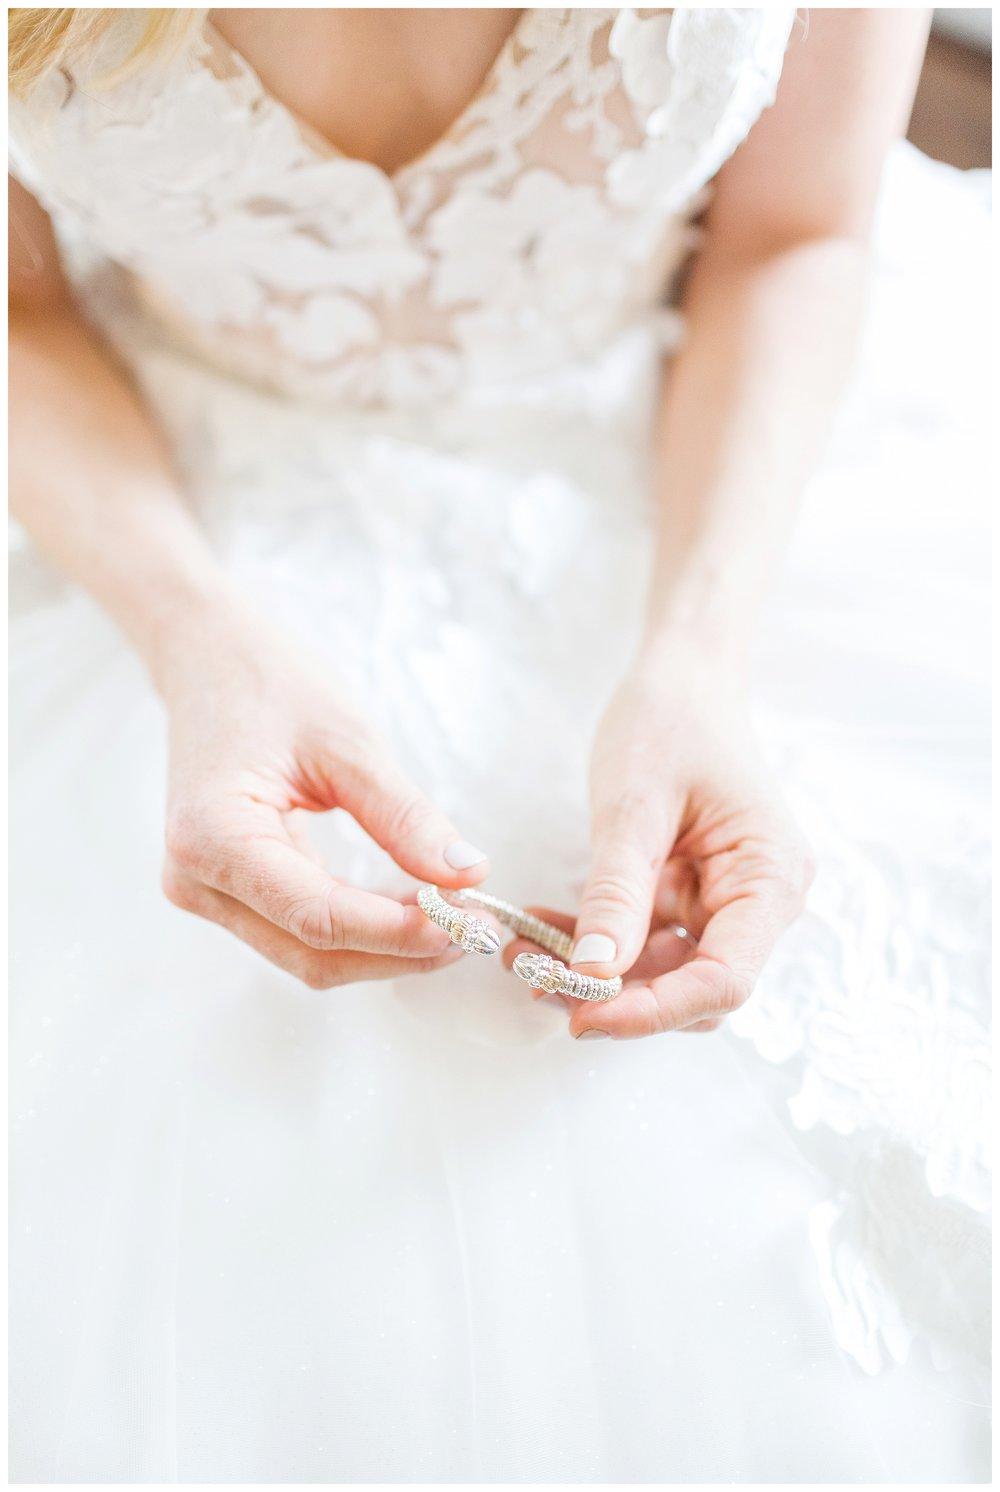 Stone Tower Winery Wedding Virginia Wedding Photographer Kir Tuben_0021.jpg